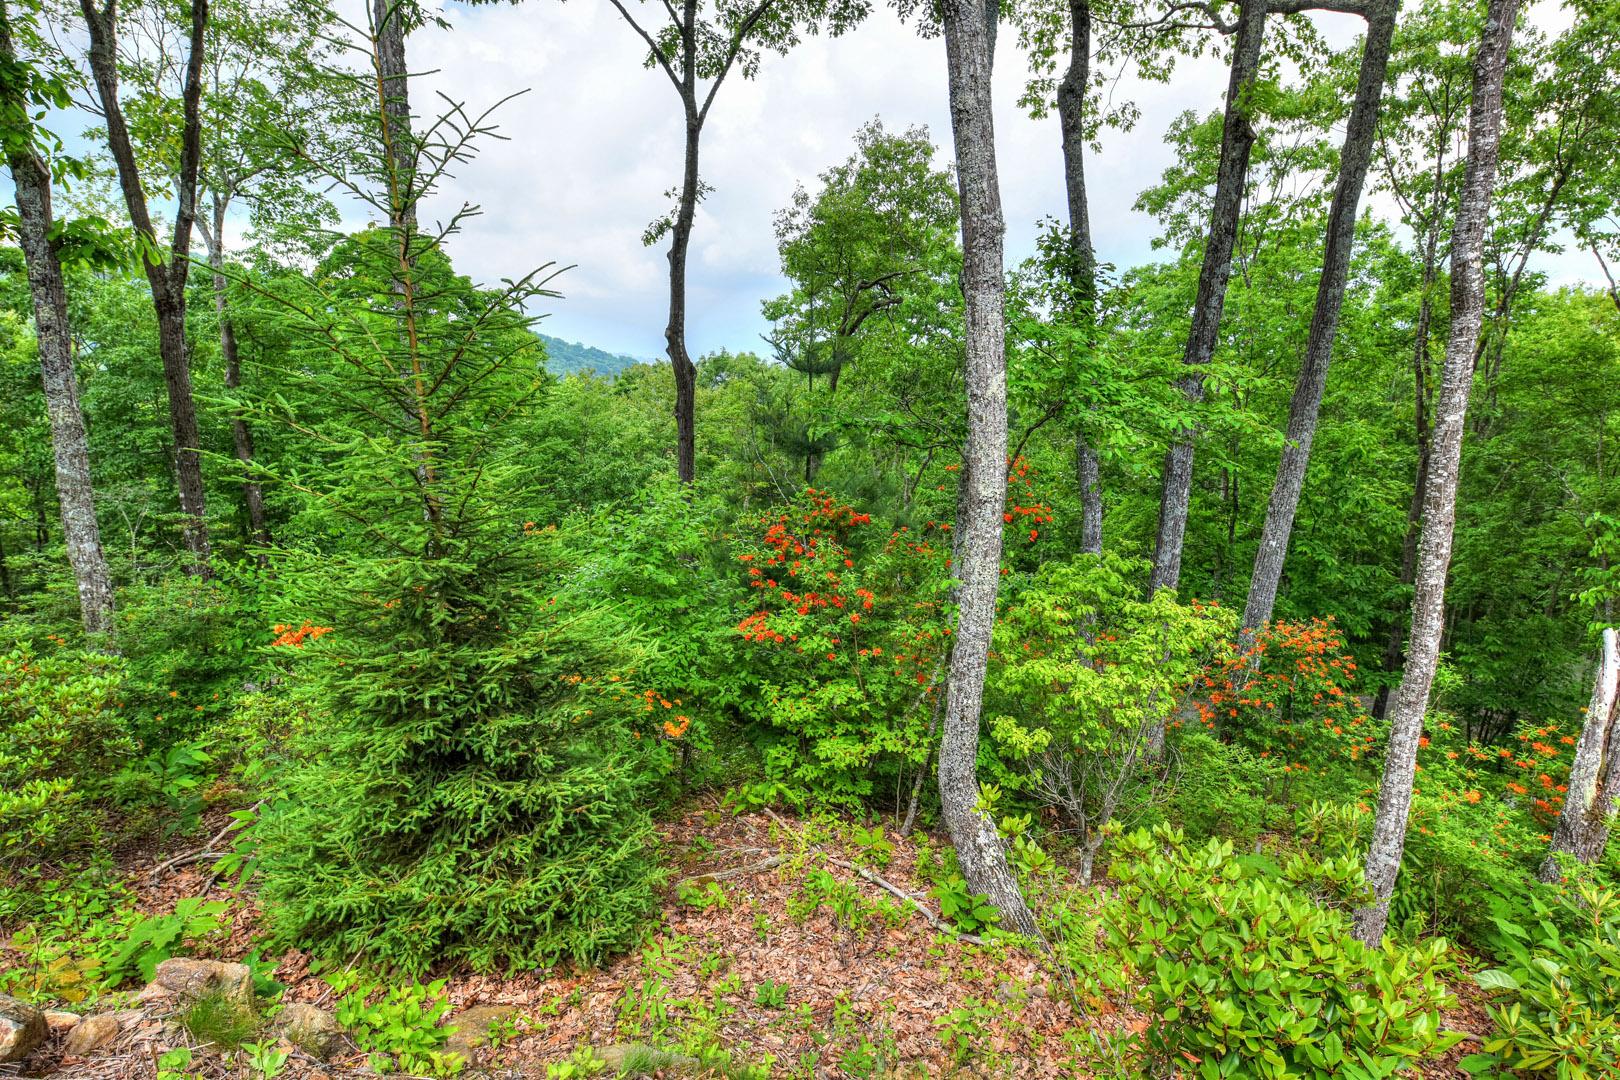 Balsam mountain preserve corkscrew way balsam mountain for Balsam mountain